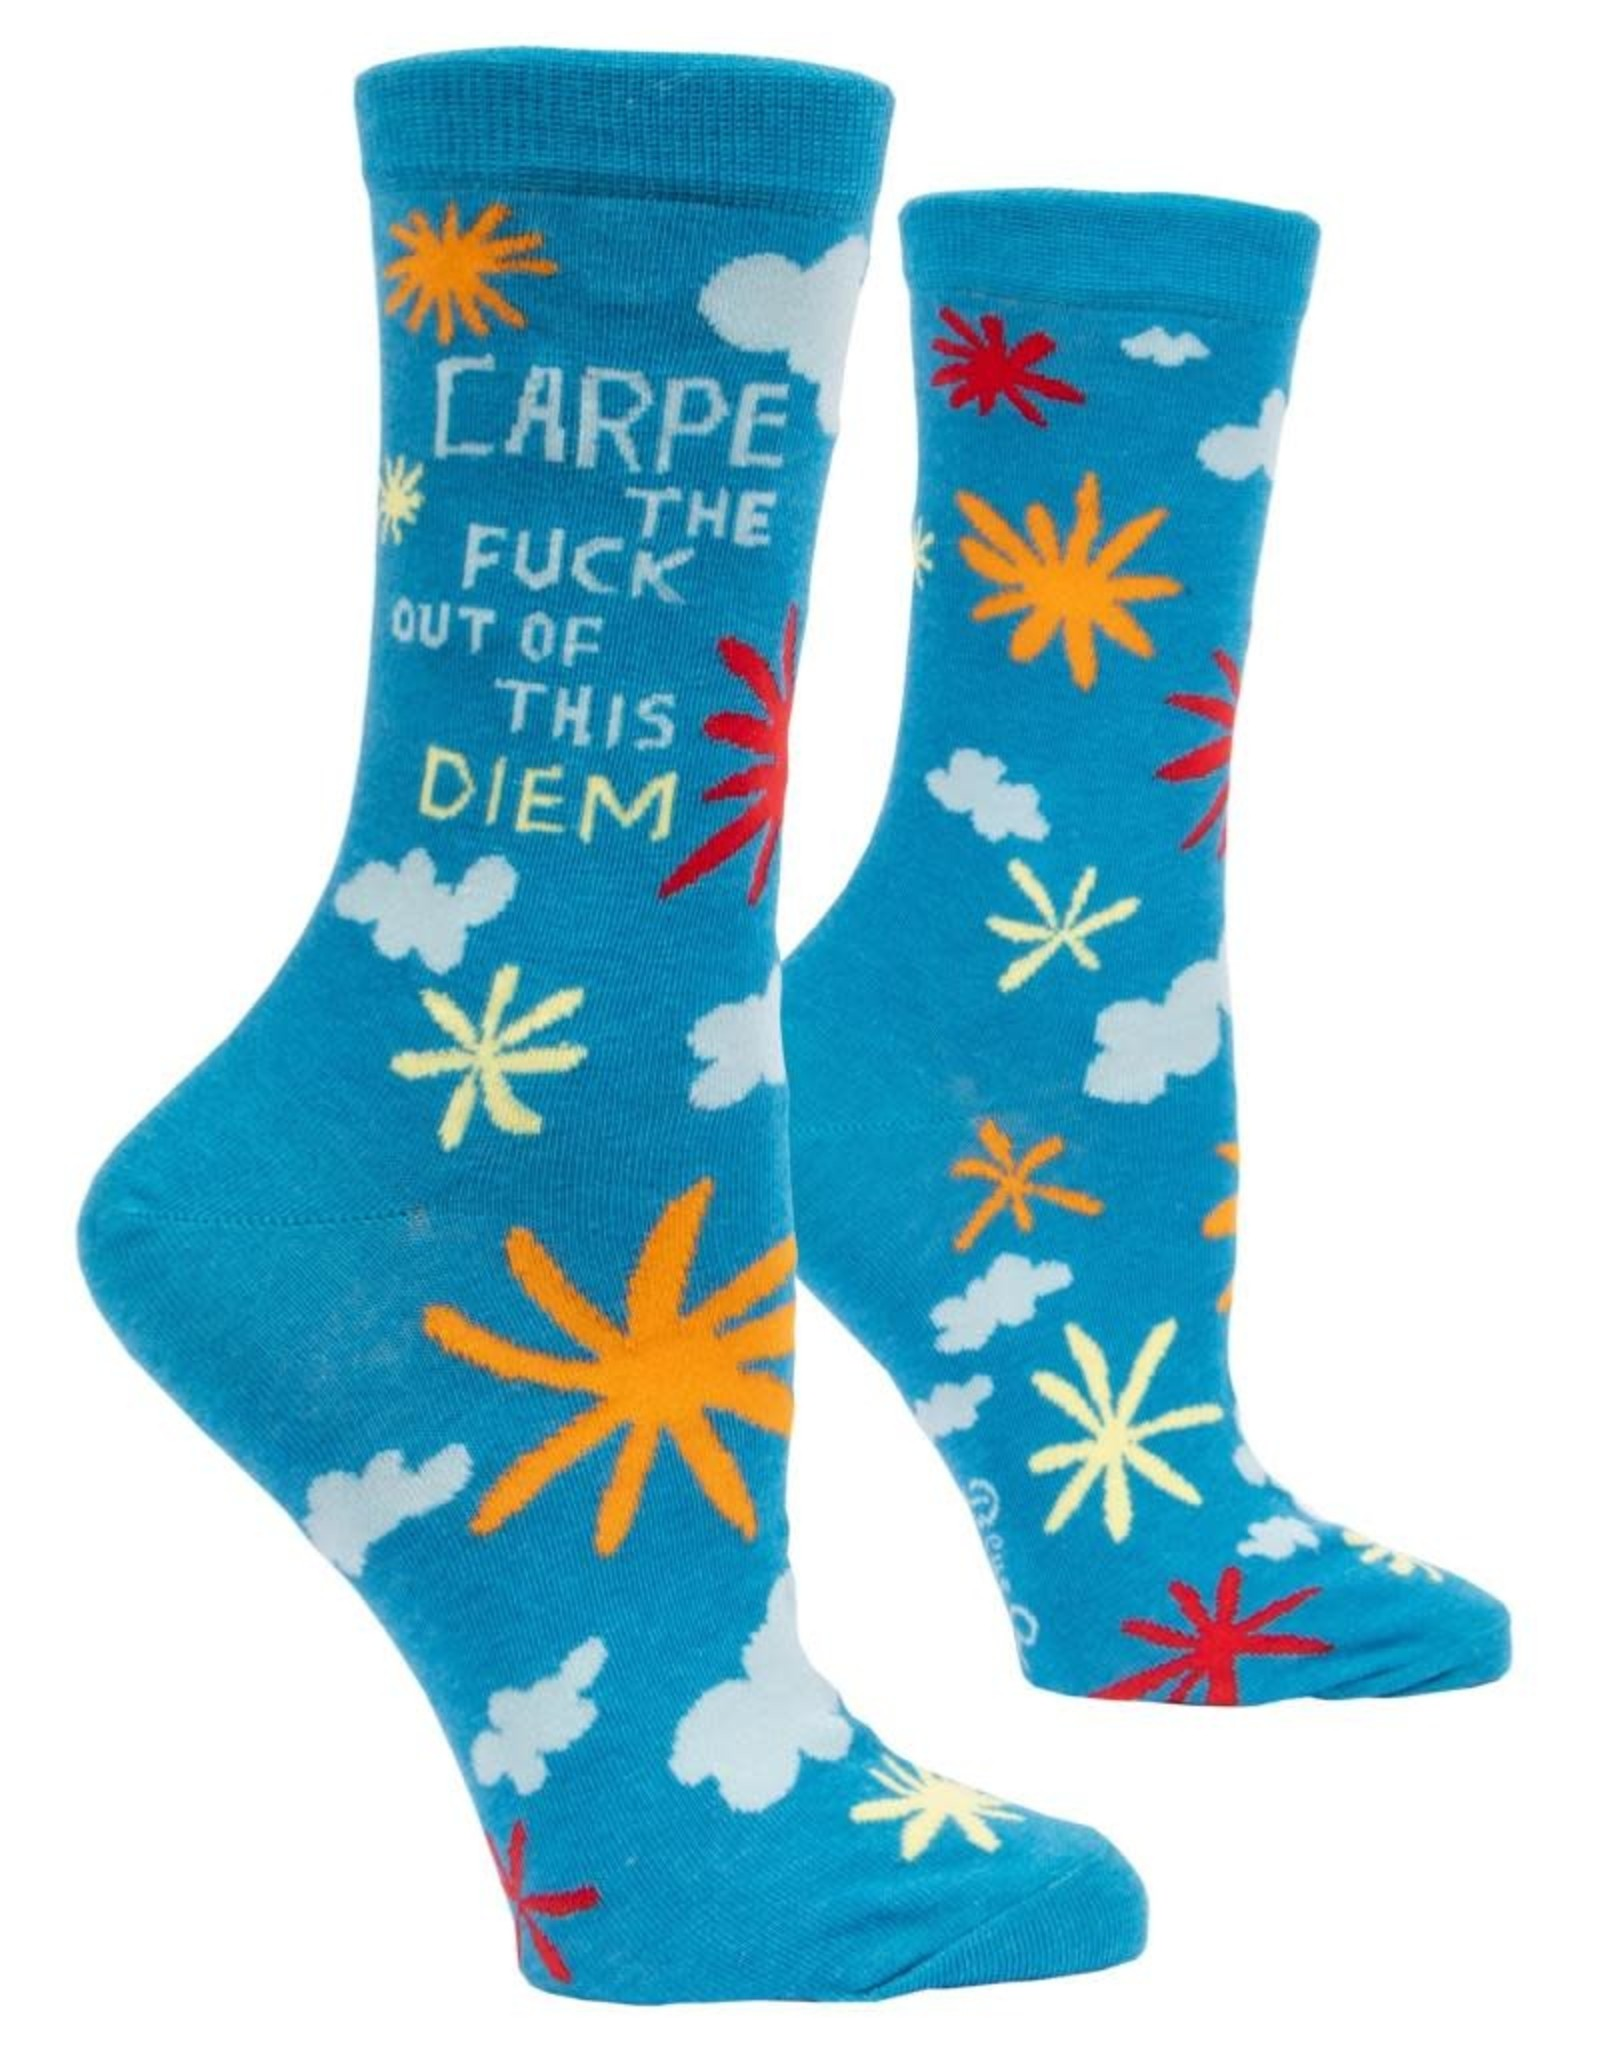 Blue Q Carpe the Fuck Out of This Diem Women's Crew Socks